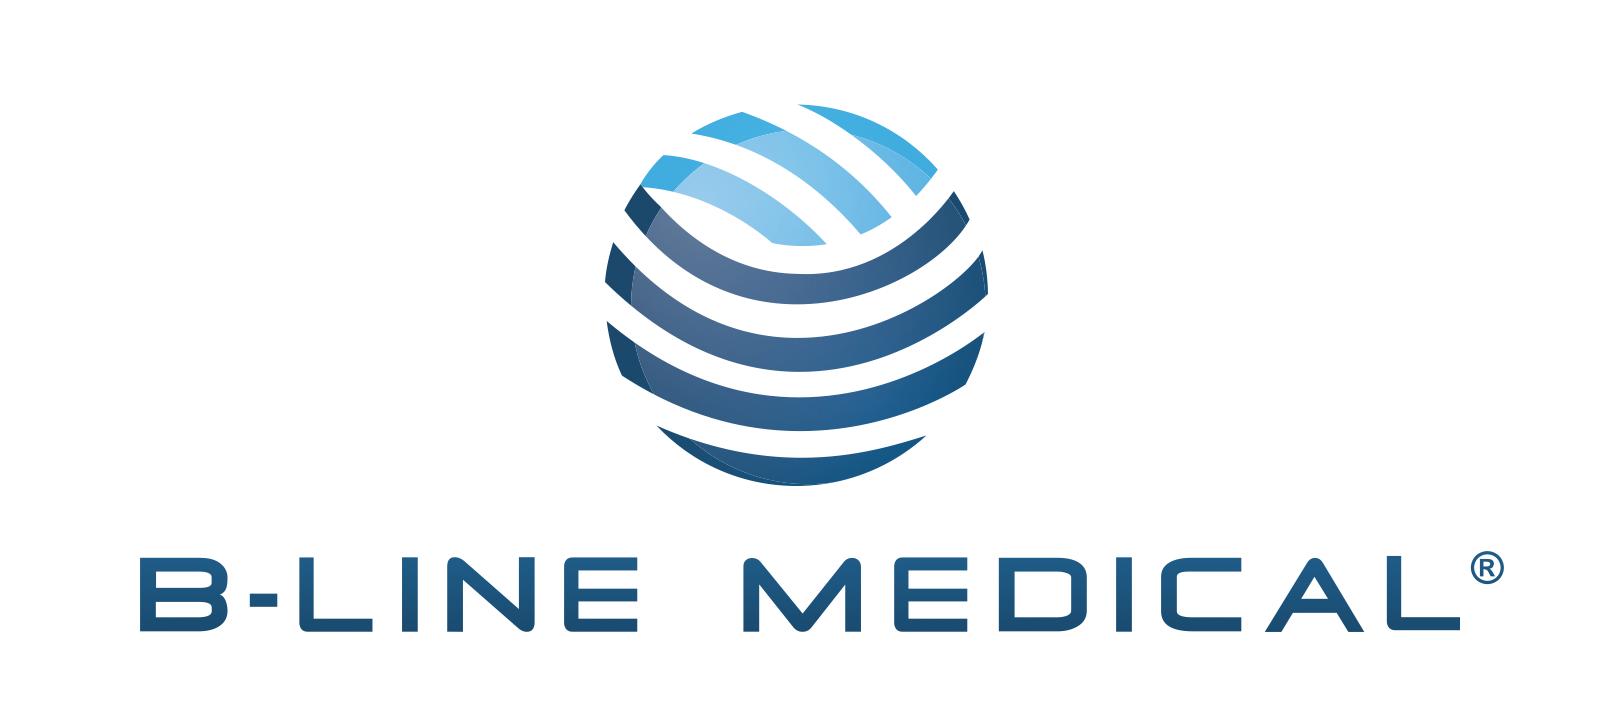 b-line medical logo